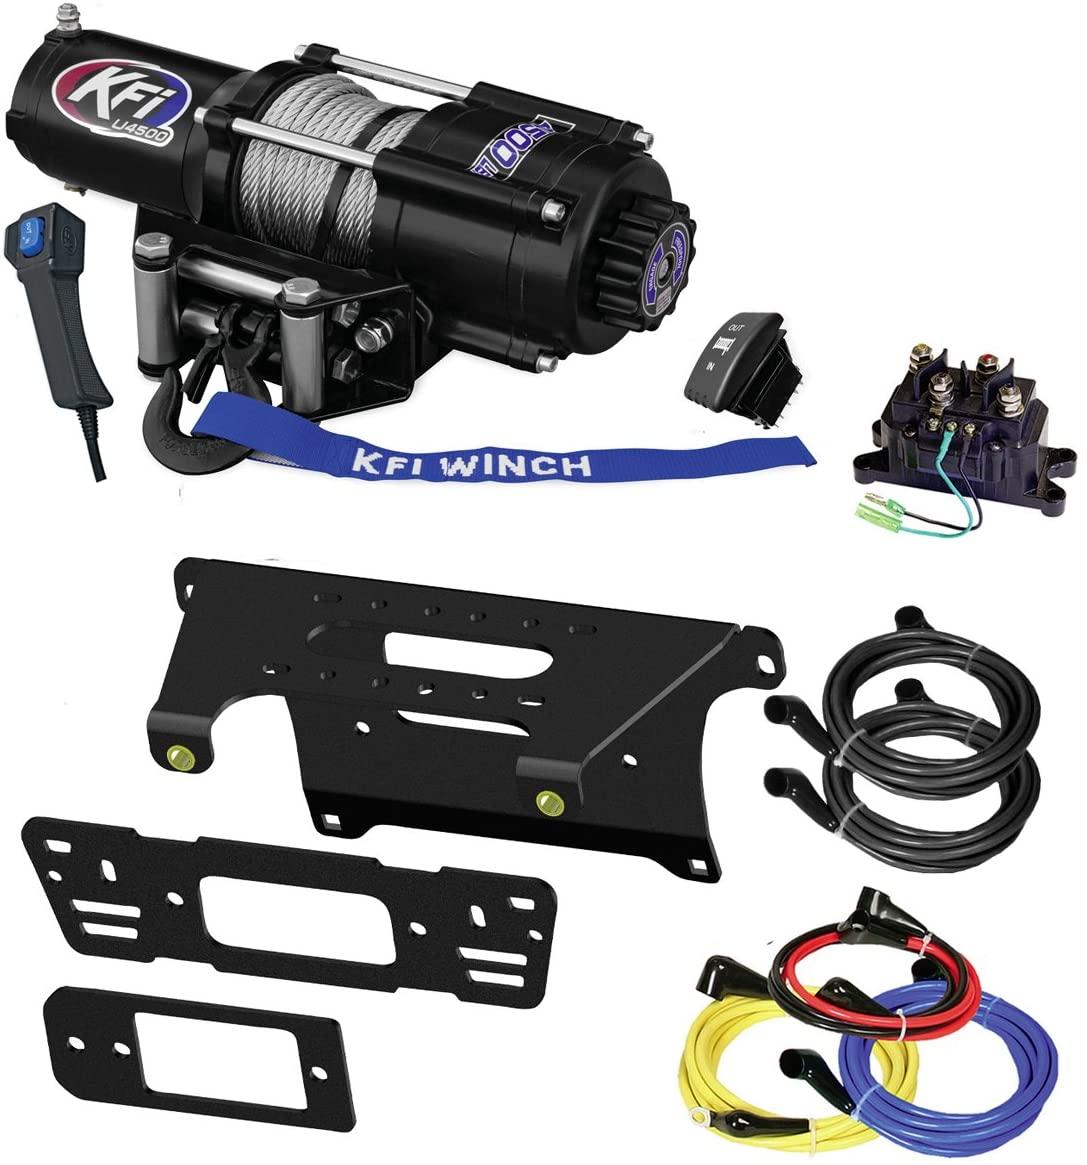 KFI Combo Kit - U45-R2 4500lbs Winch & Mount Bracket - compatible with 2014-2018 Polaris 900 Ranger Crew 4x4